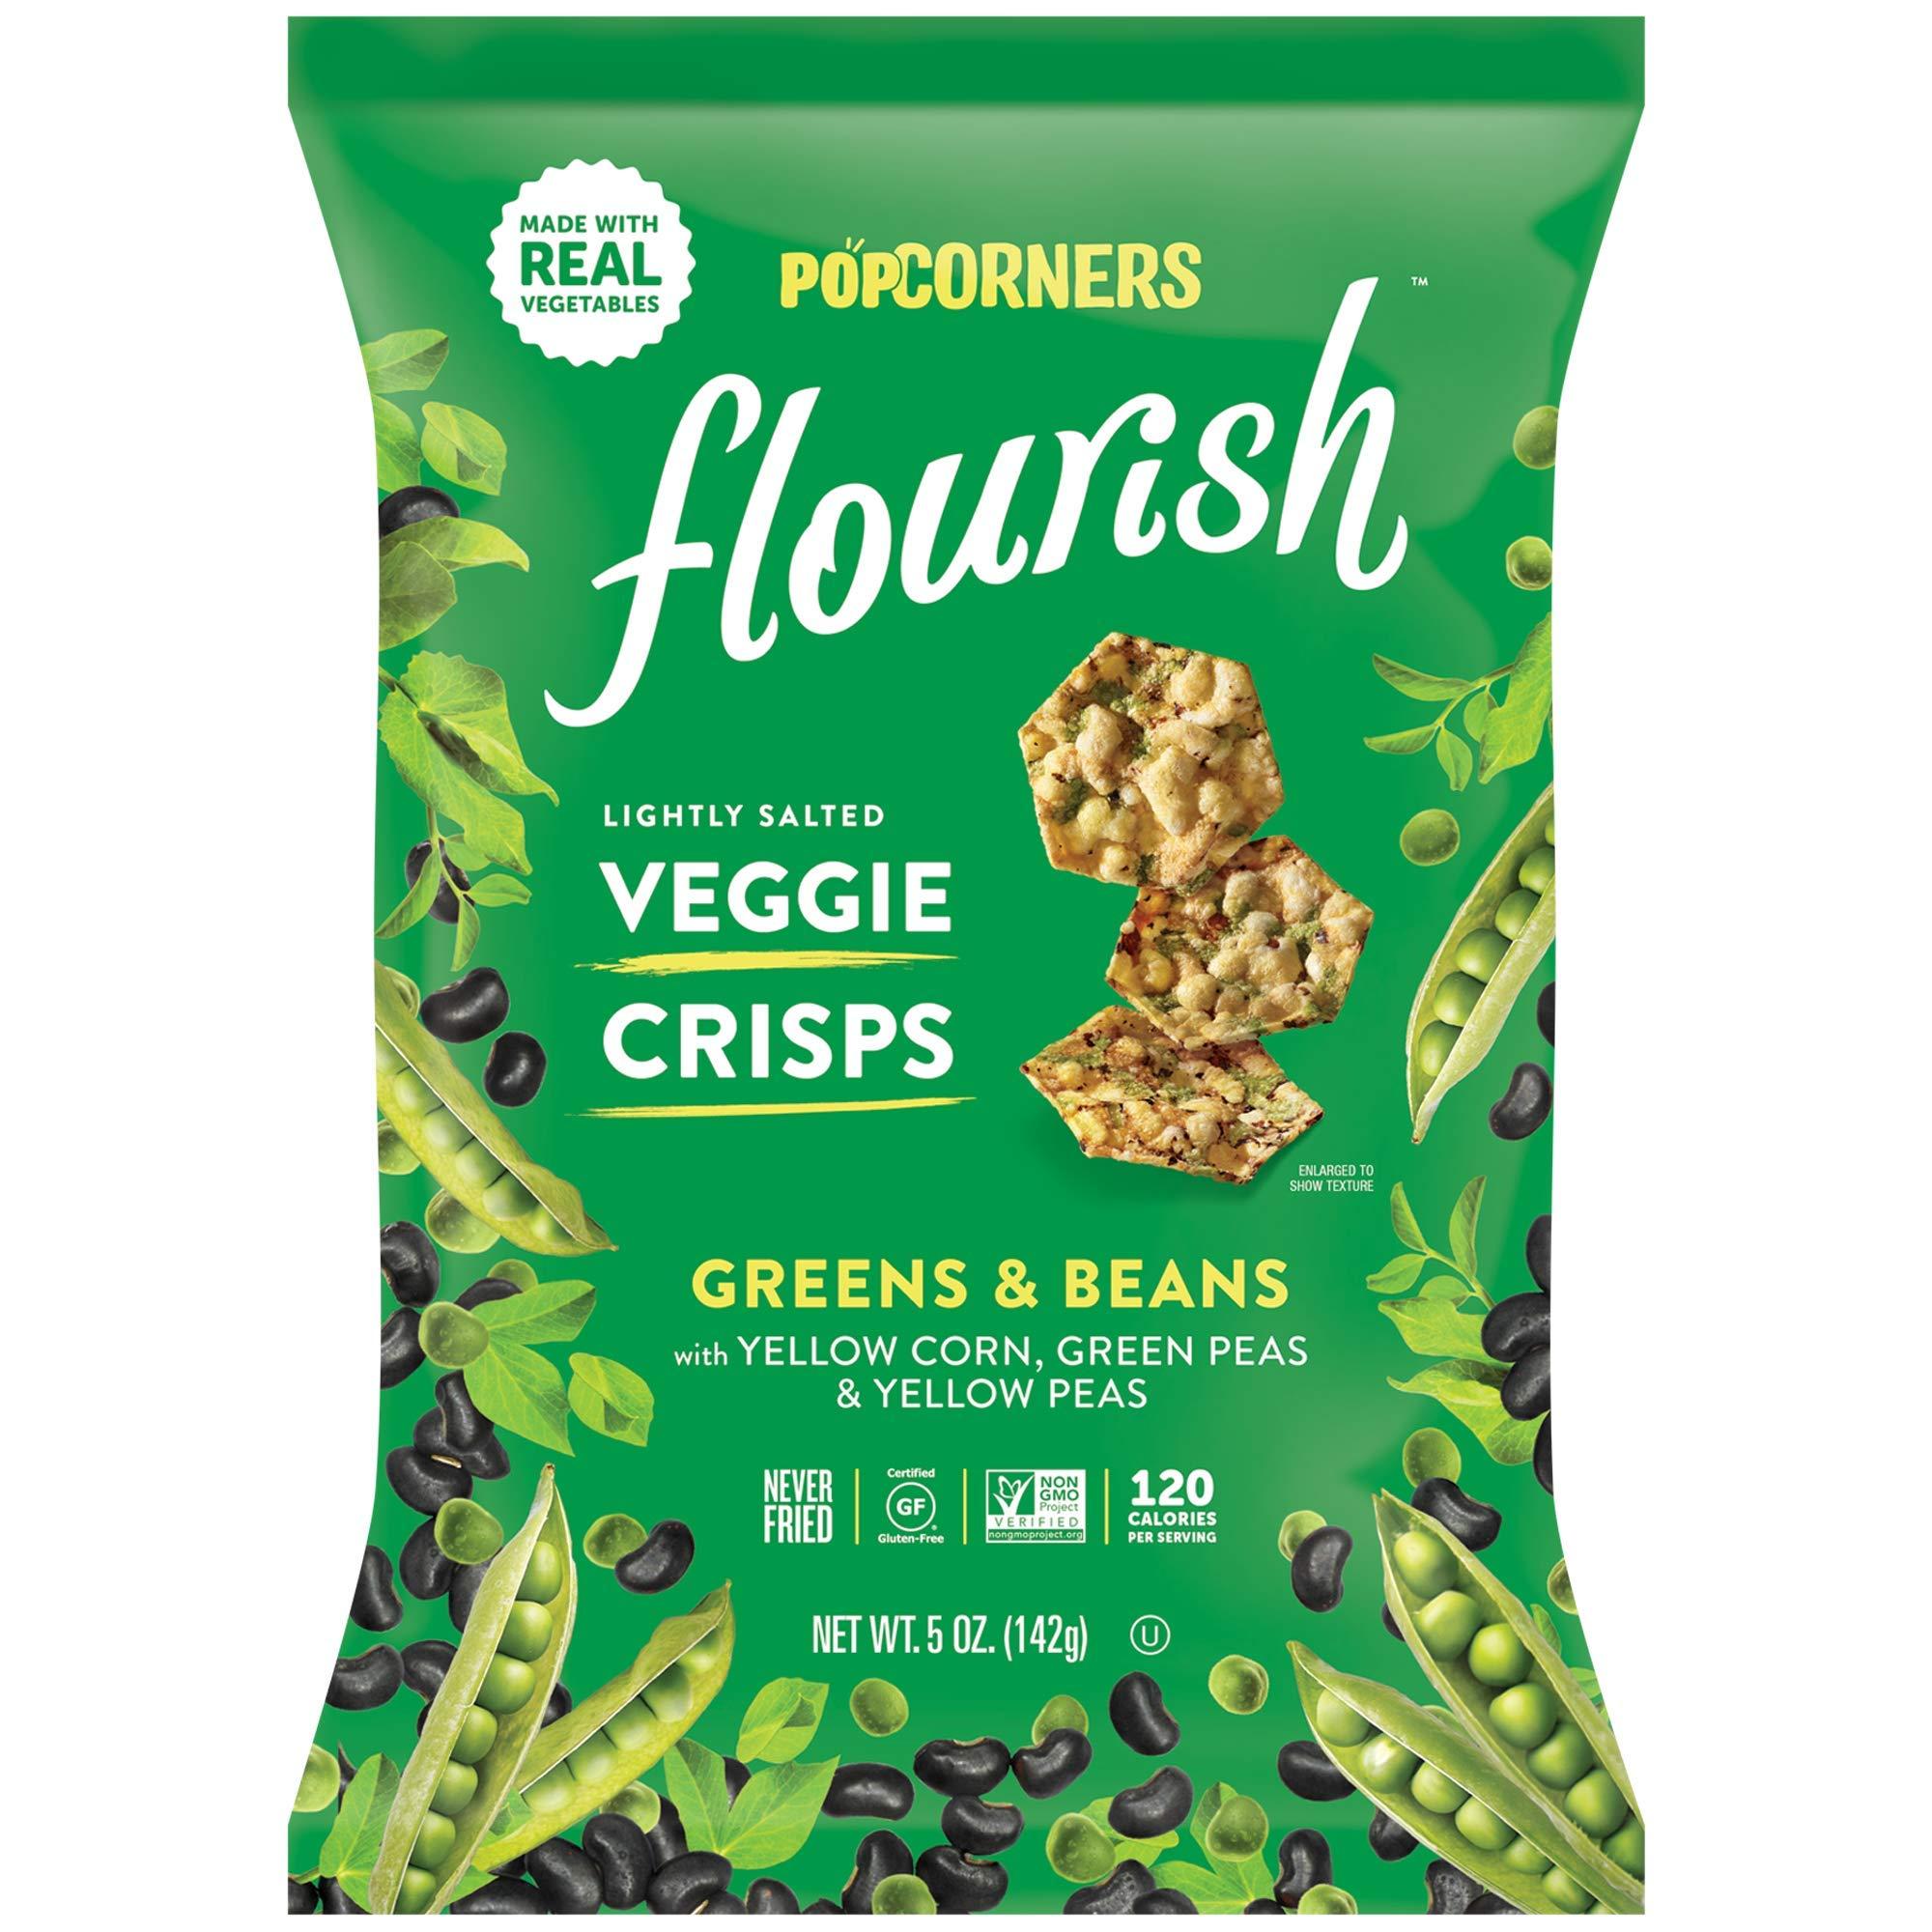 PopCorners Flourish Greens & Beans Veggie Crisps | Plant-Based Protein, Gluten Free Snacks | (12 Pack, 5 oz Snack Bags) by Popcorners